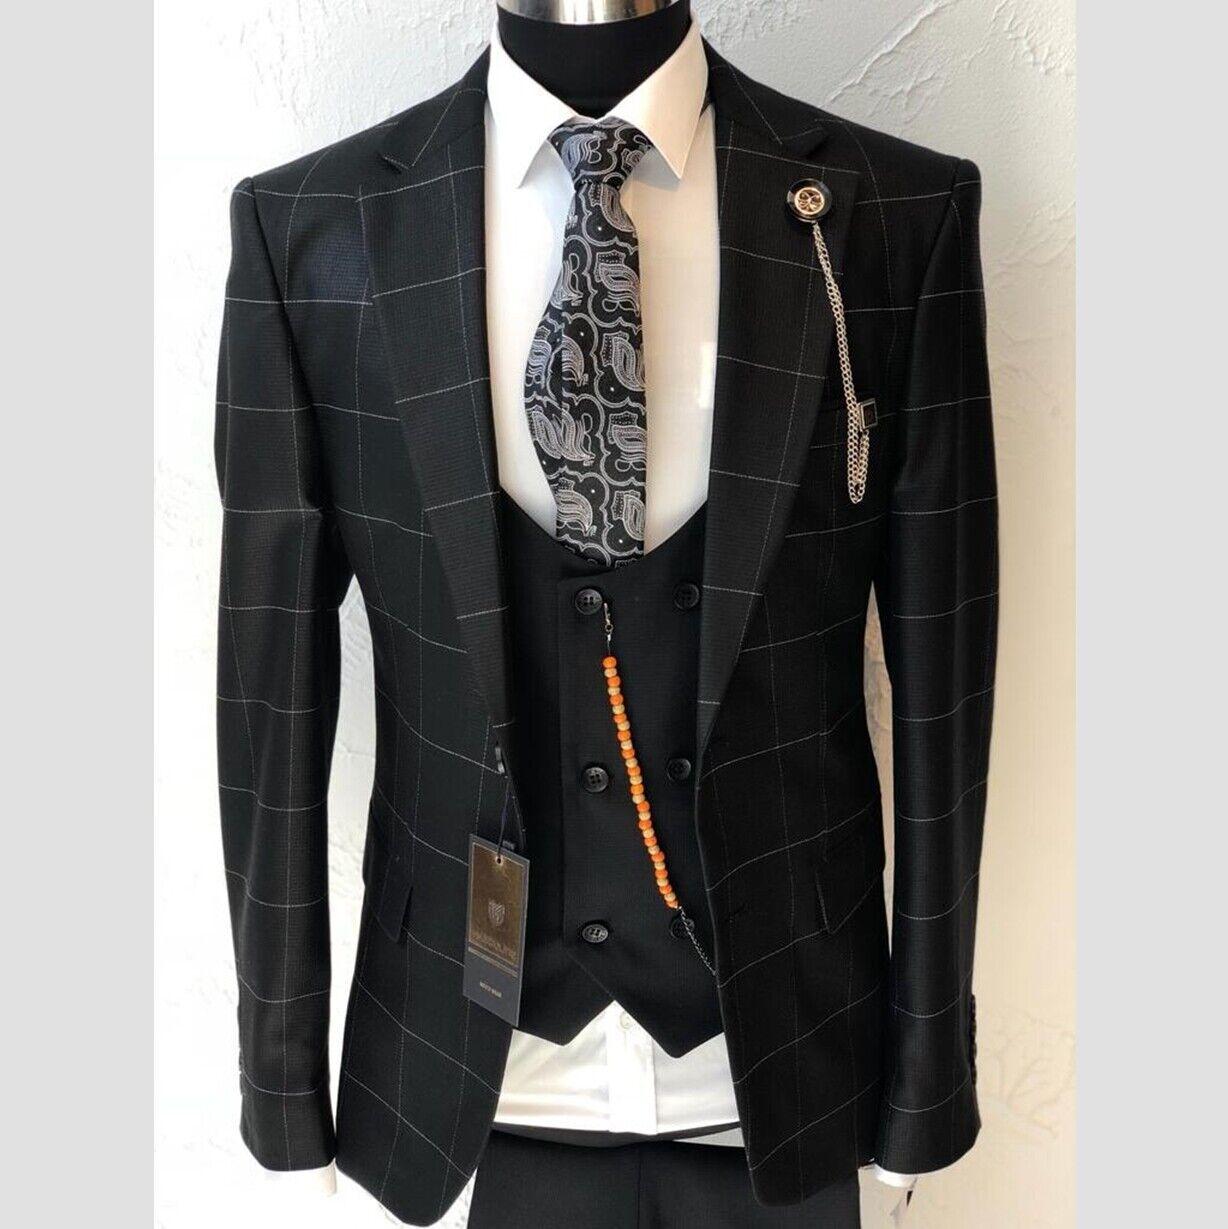 Herren Anzug Elegant 3-teilig Jacke Hose Weste Gr.46-56 Schwarz Kariert